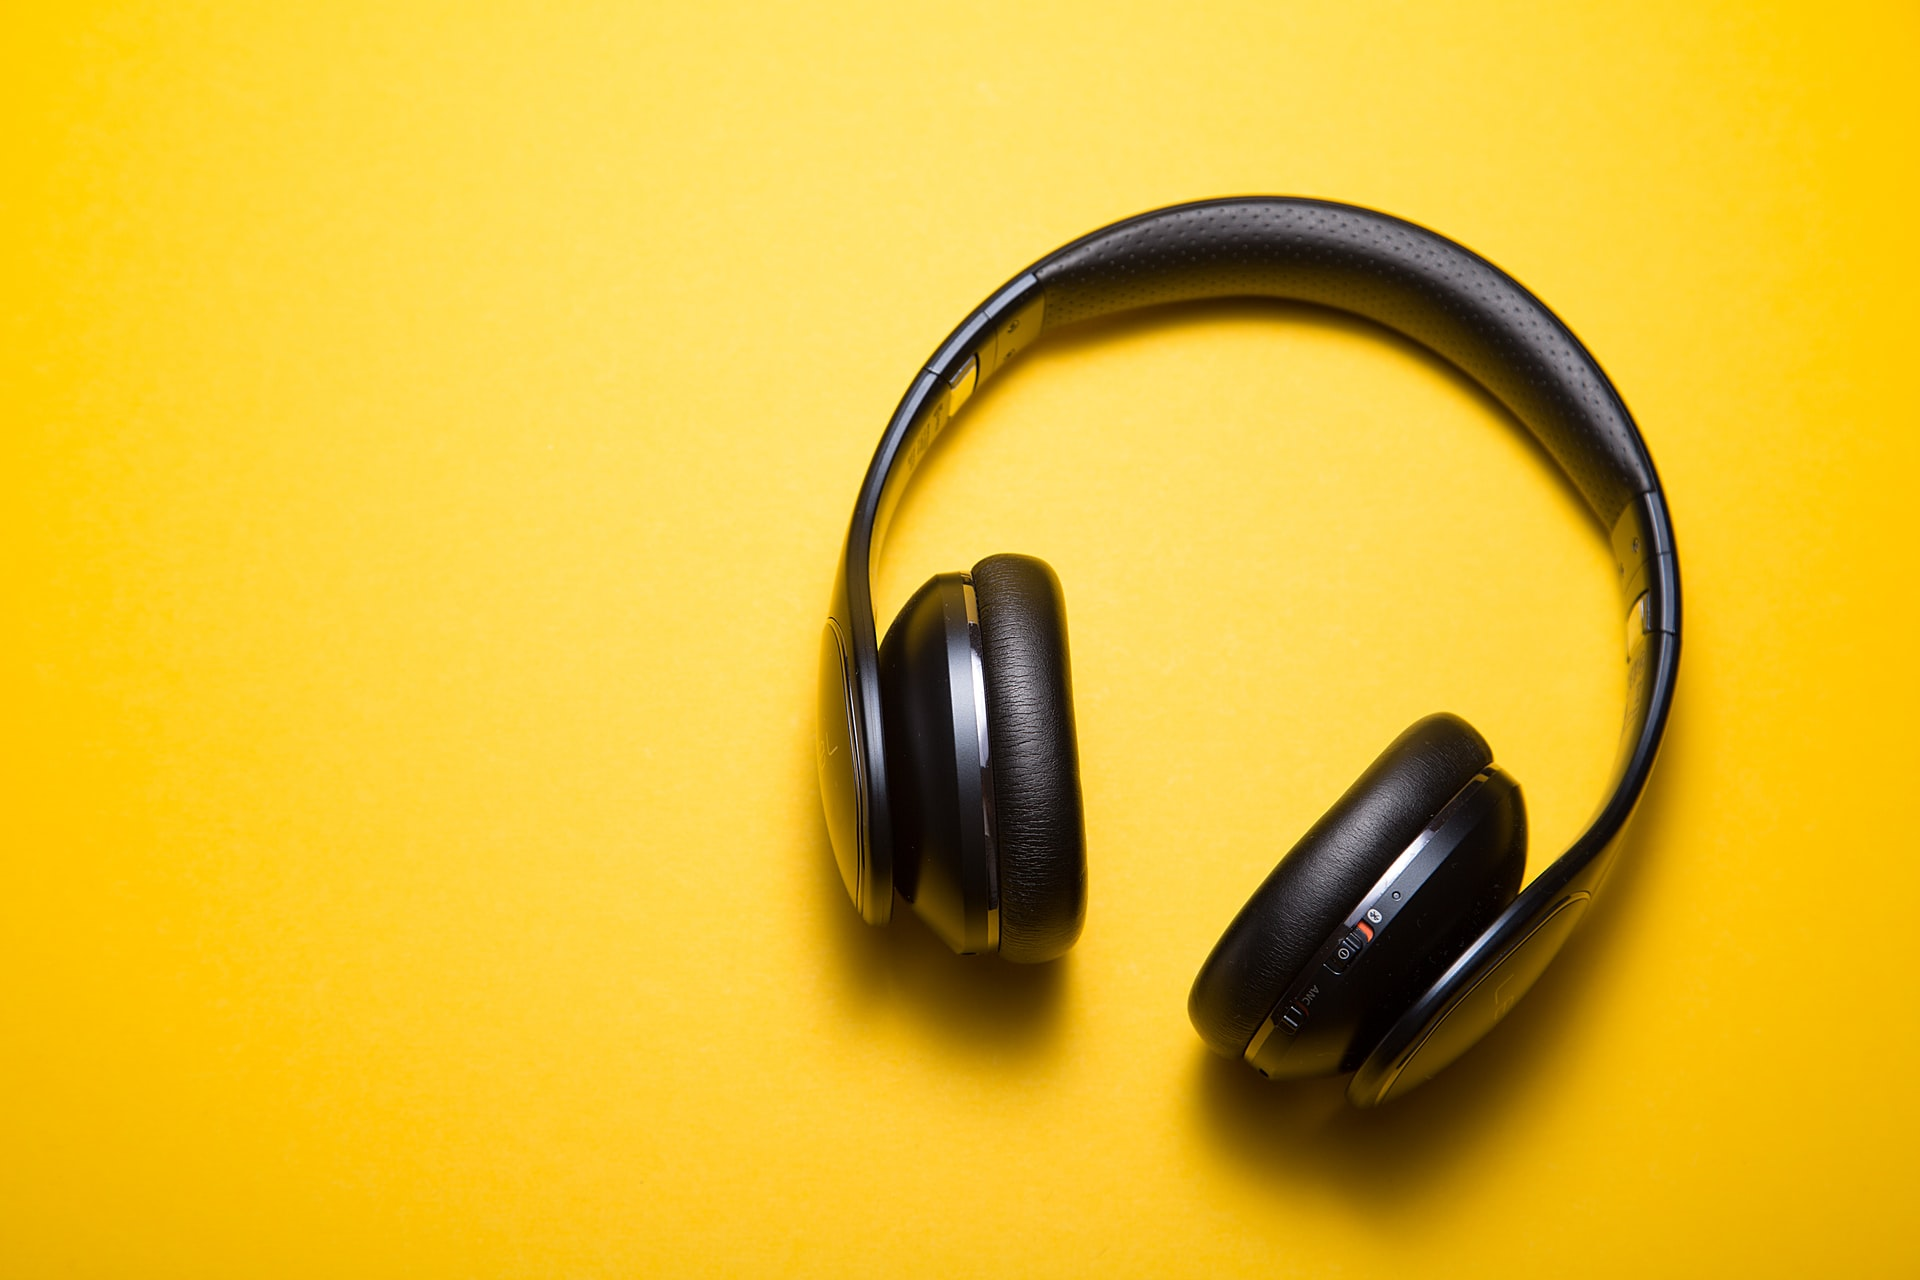 review thijs lindhout podcast premium